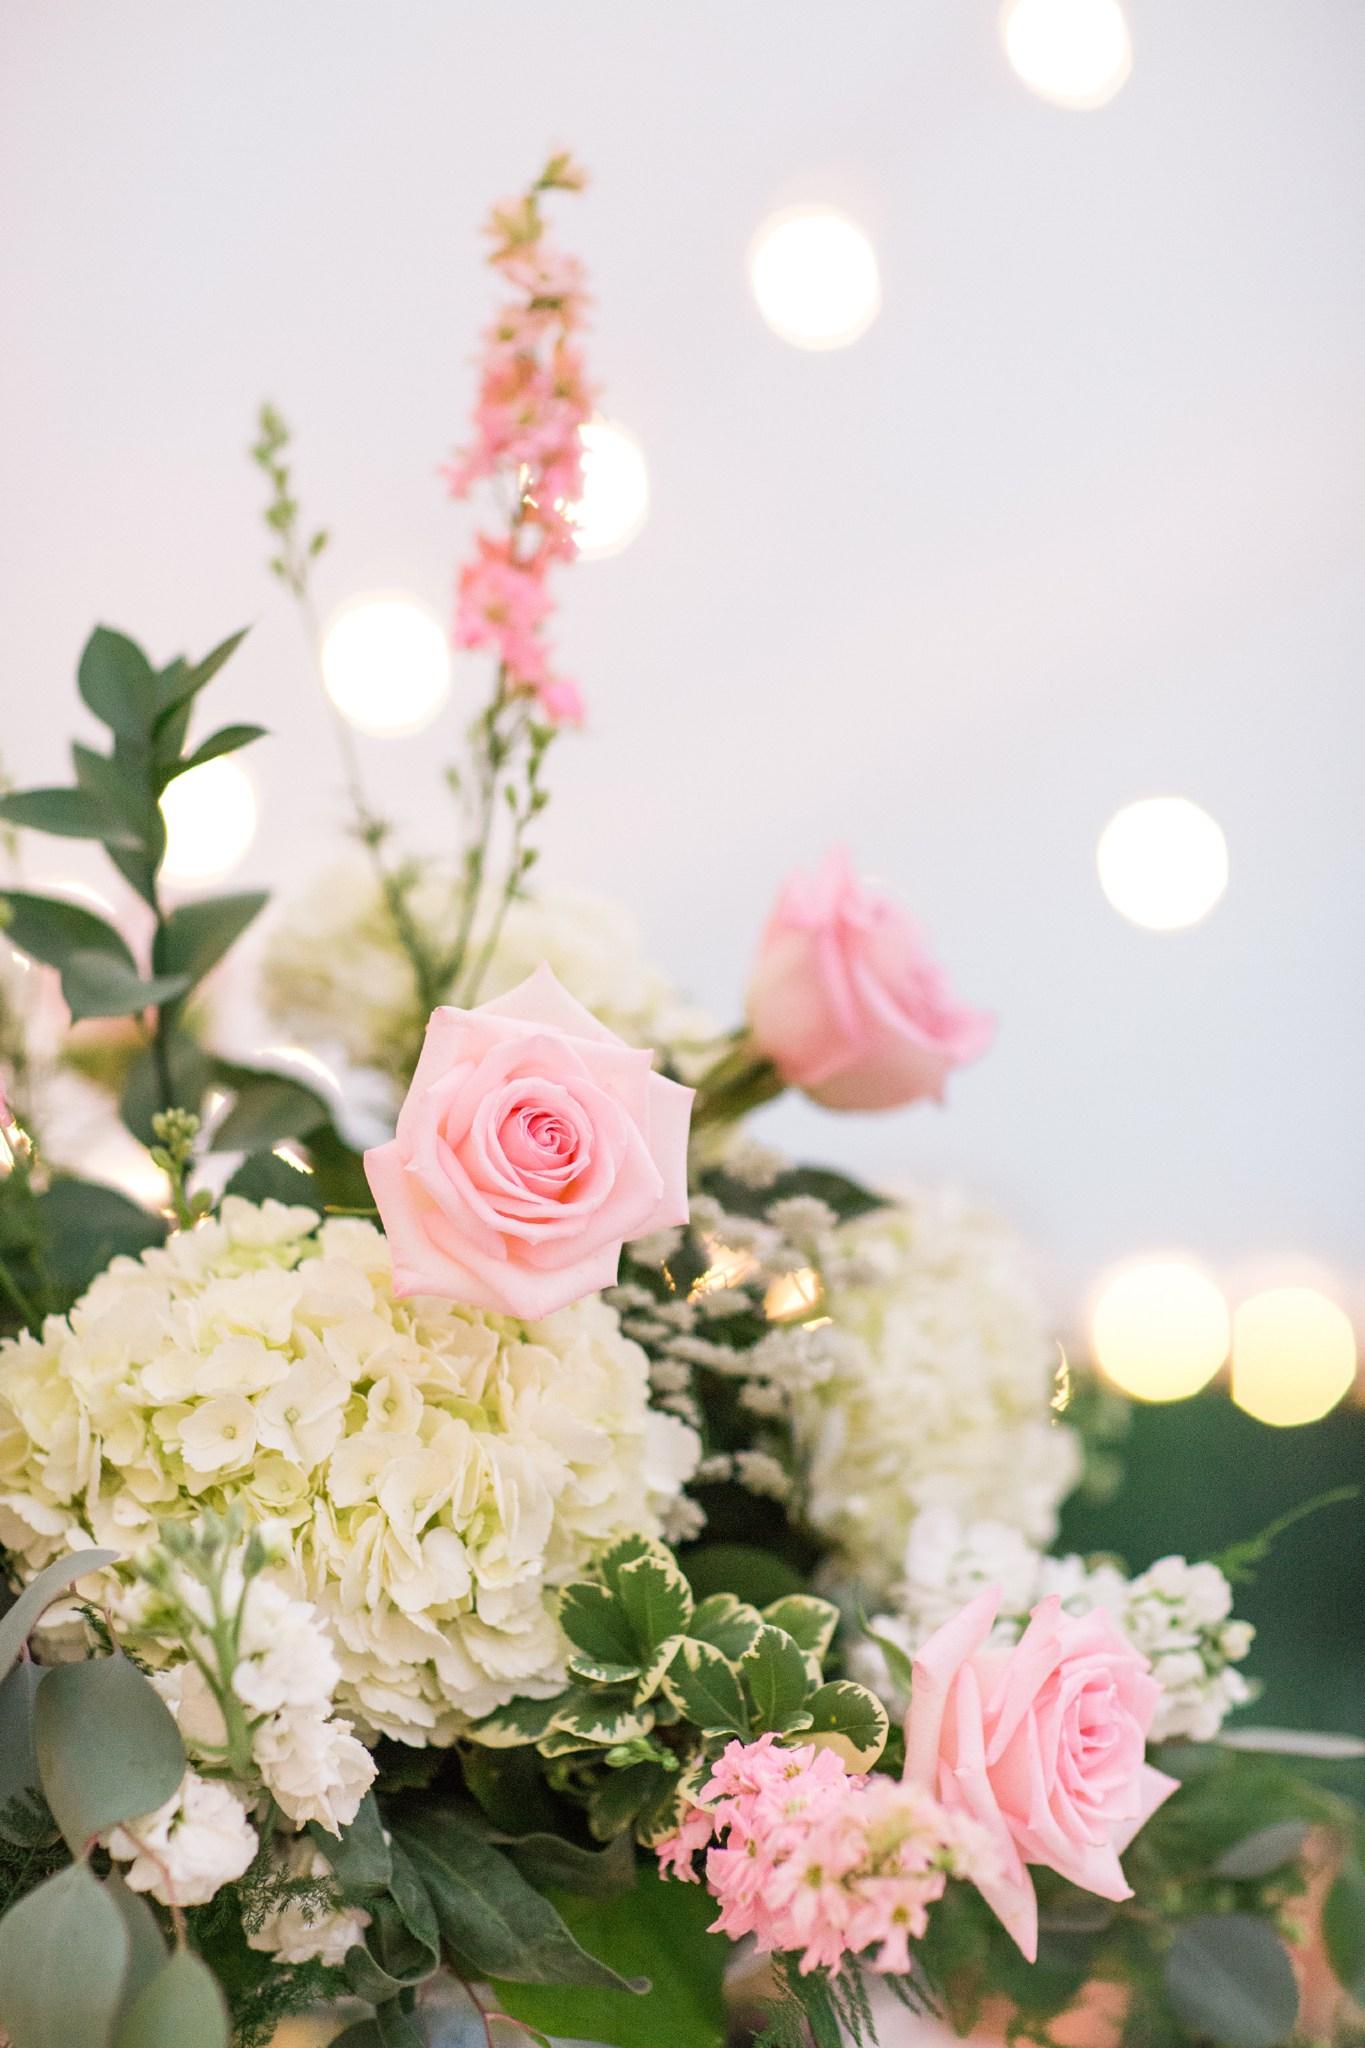 deborah_zoe_photography_best_of_flowers_2016_00033.JPG